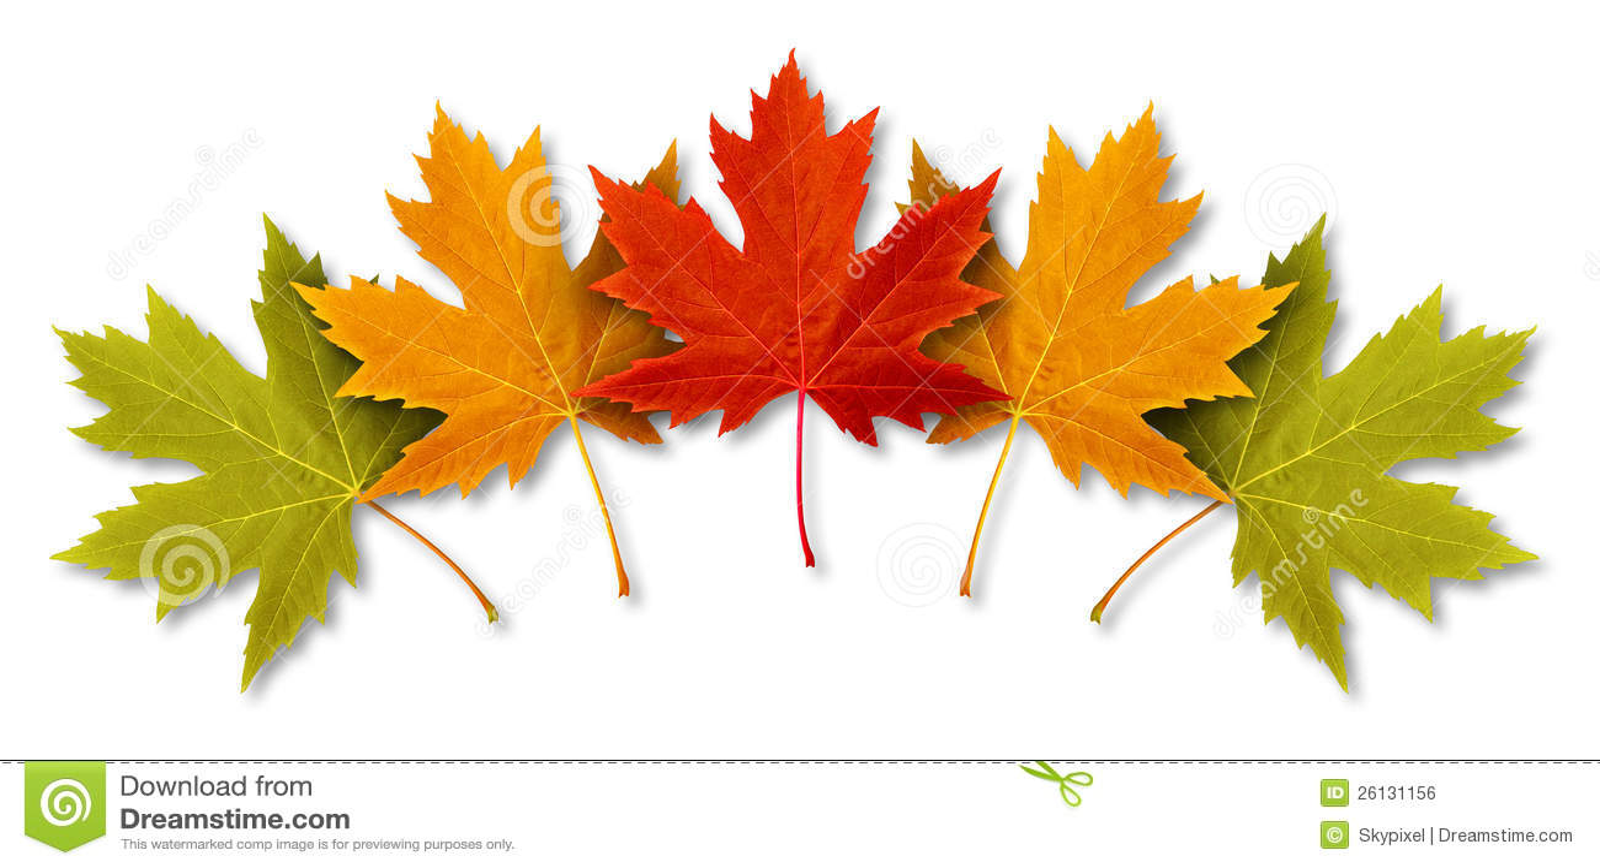 Autumn Leaves Royalty Free Stock Image Image 26131156